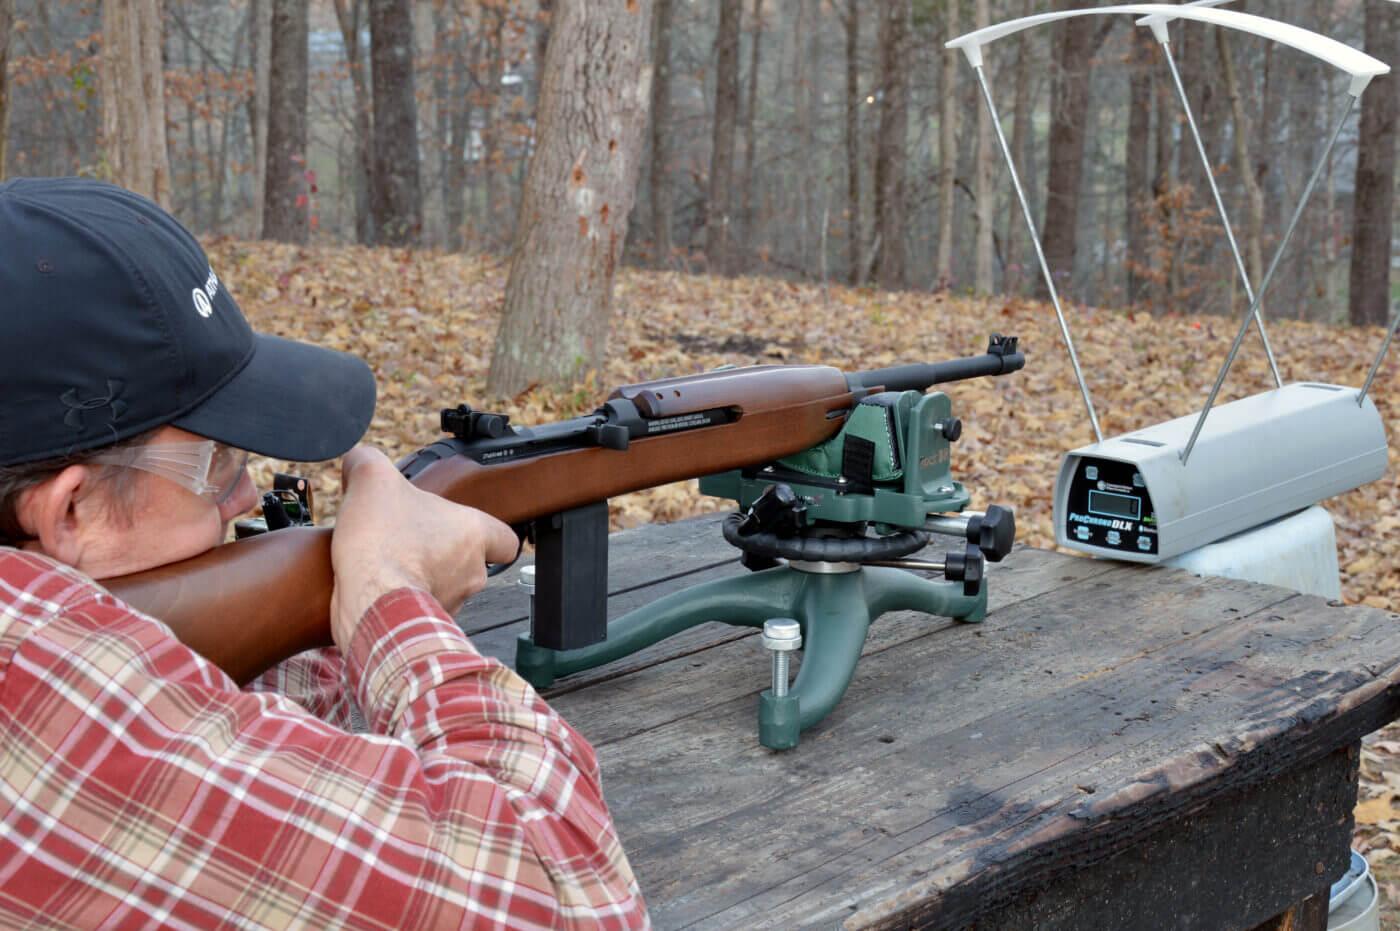 Velocity testing Springfield Armory M1 Carbine BB gun